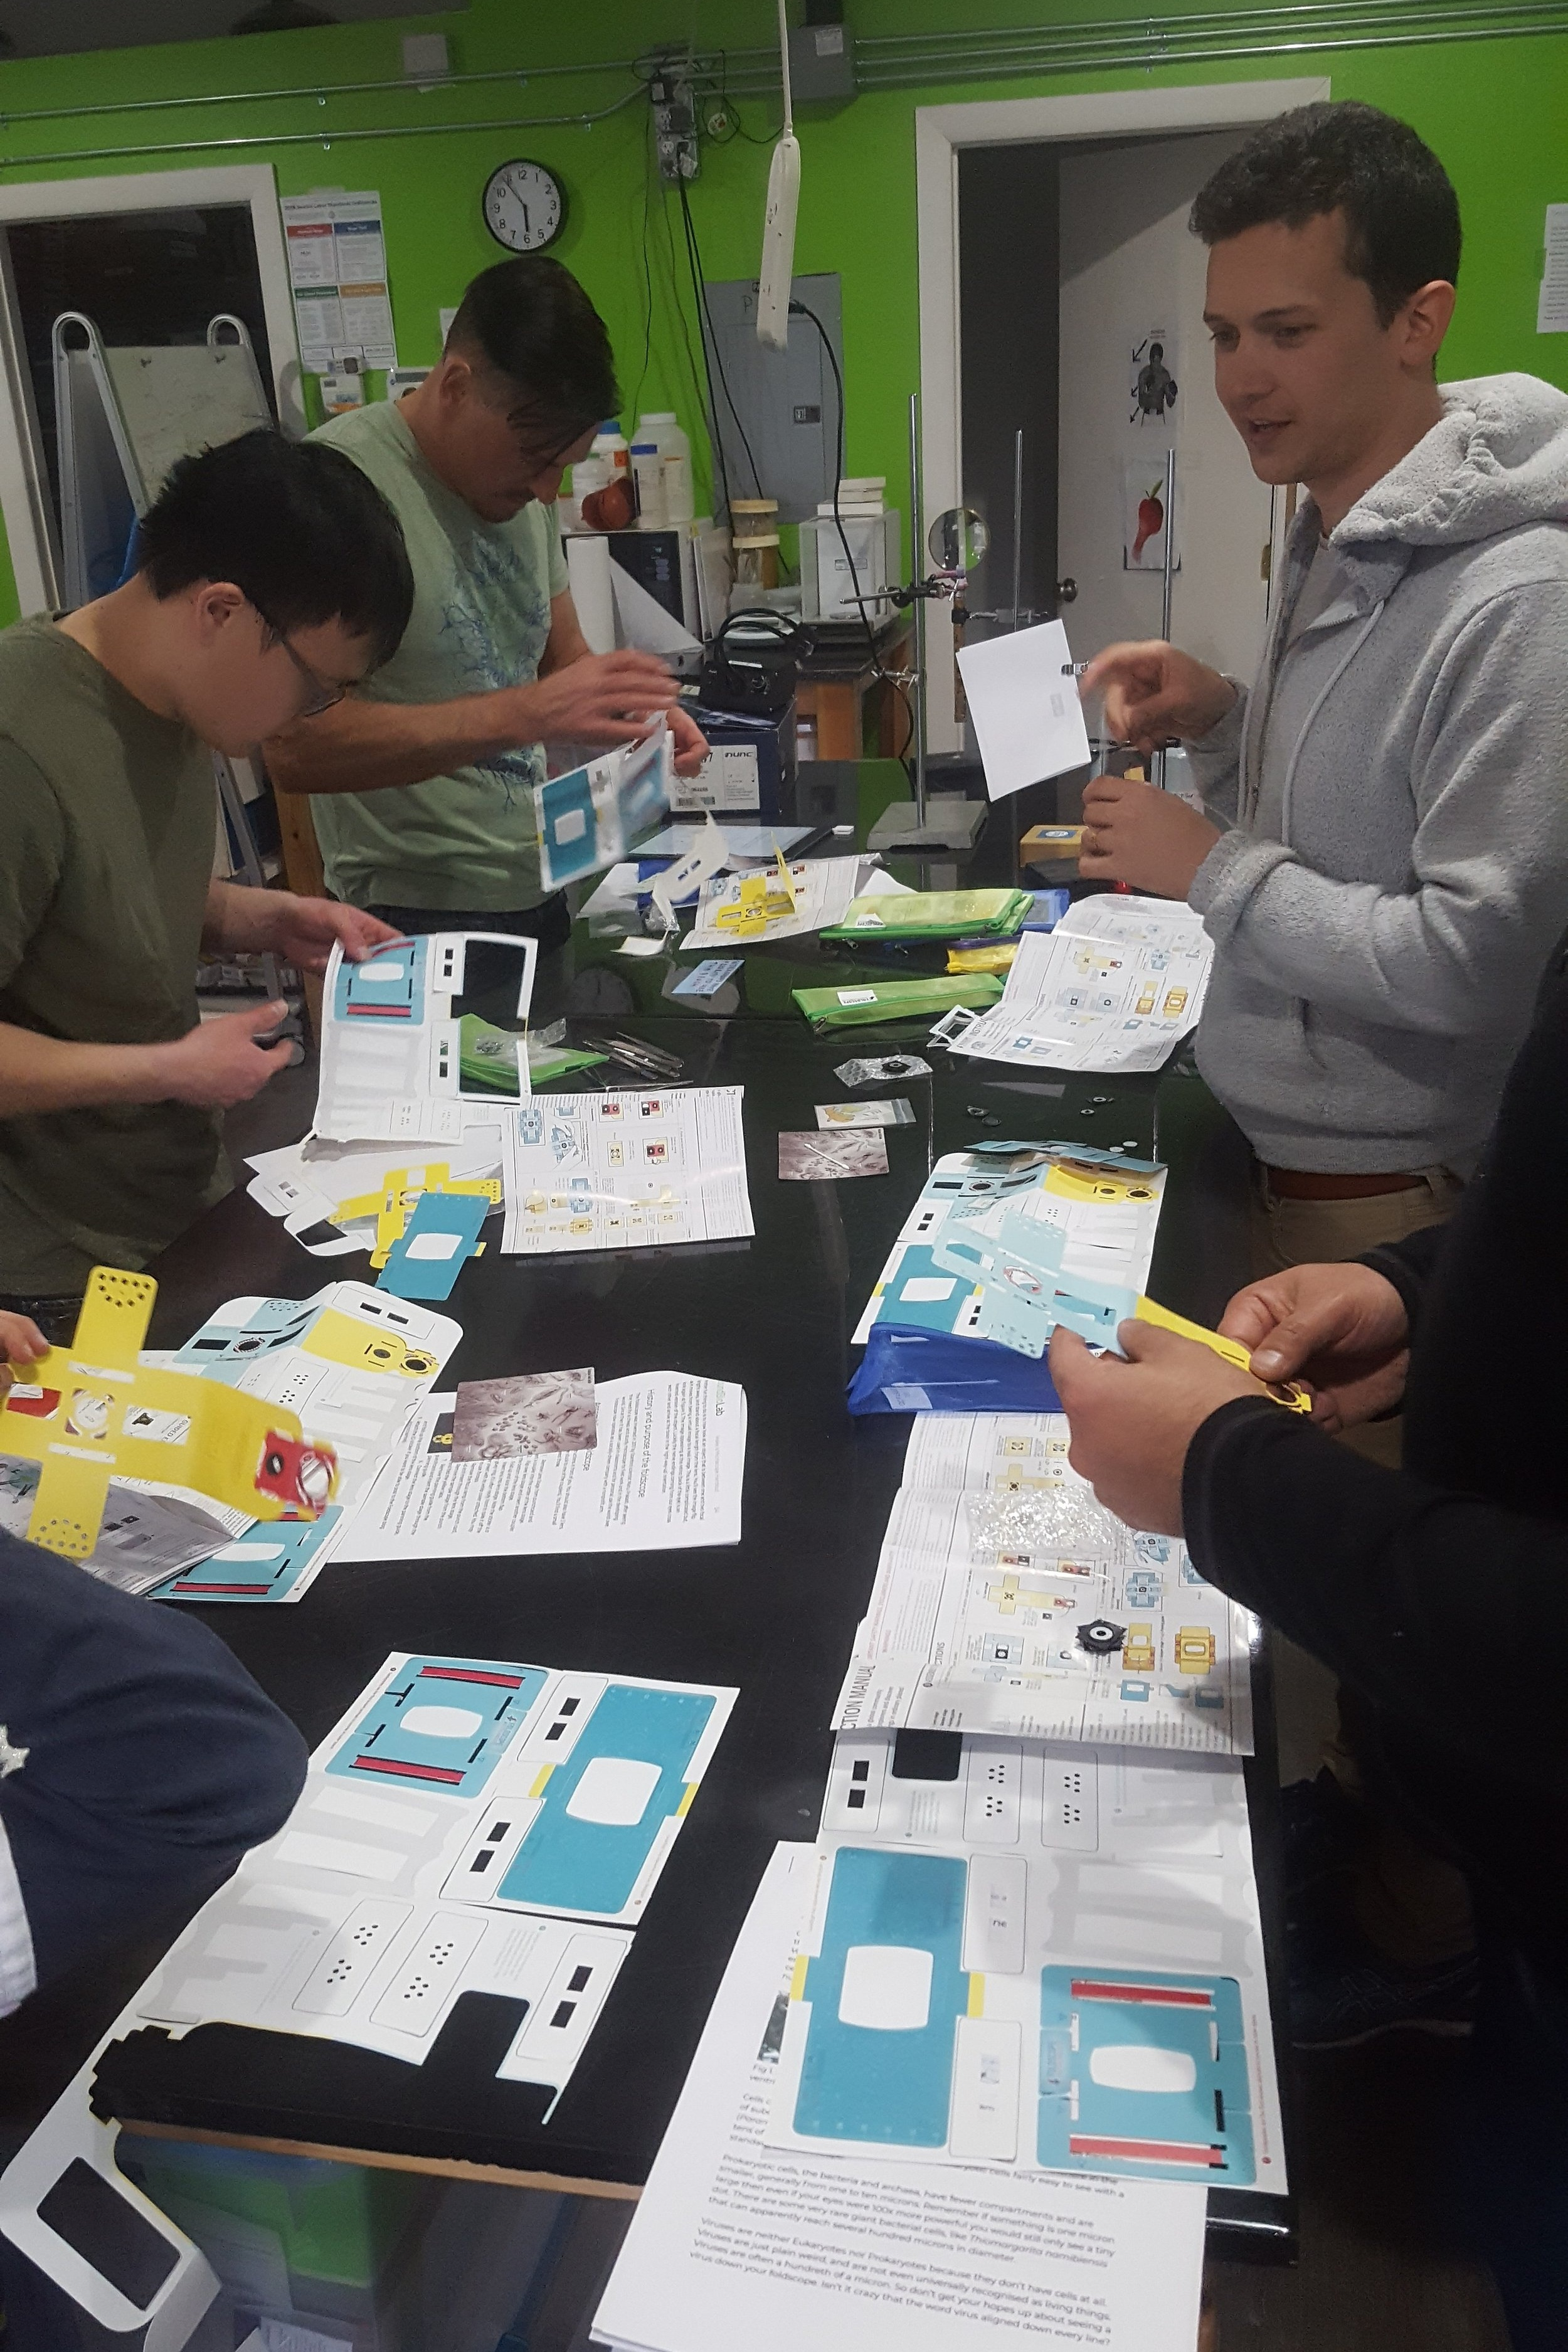 Building Foldscope Microscopes in the lab.